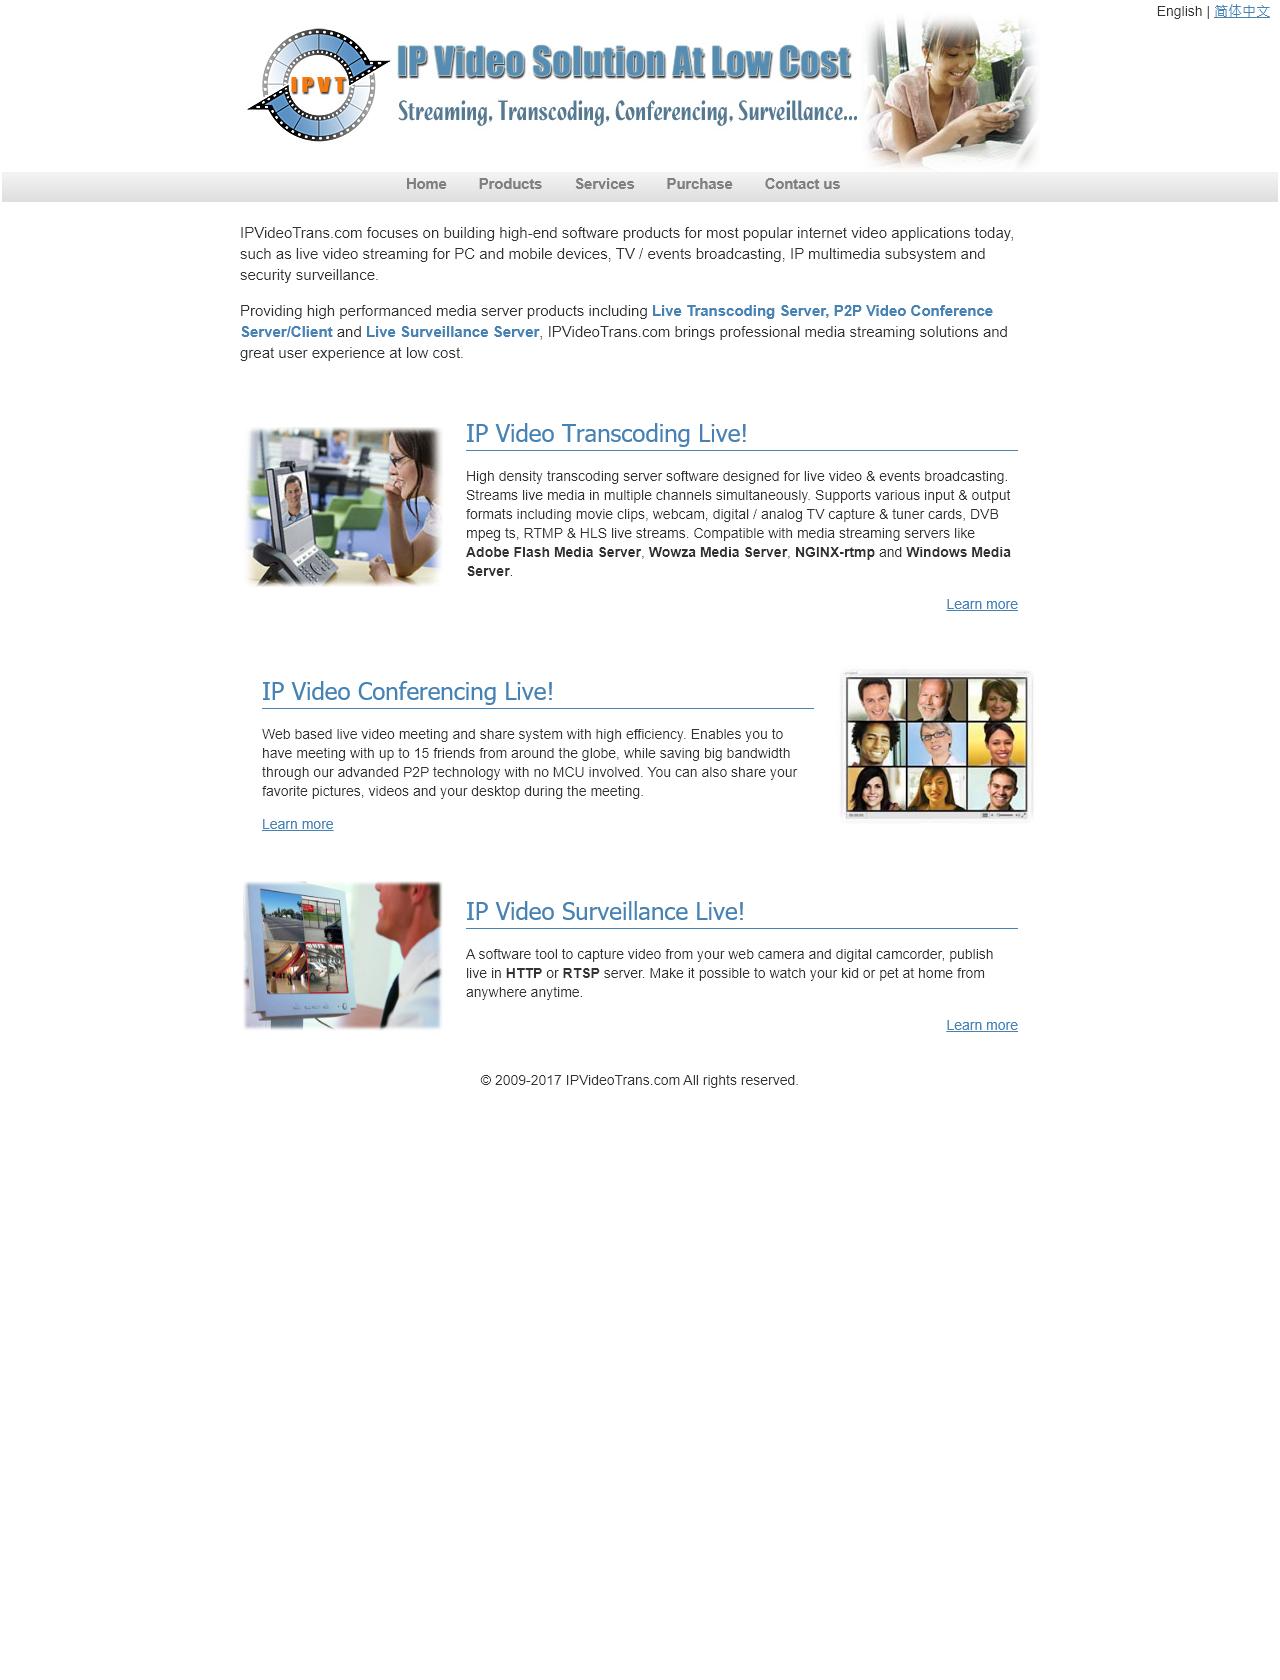 Screenshot Desktop - https://www.ipvideotrans.com/